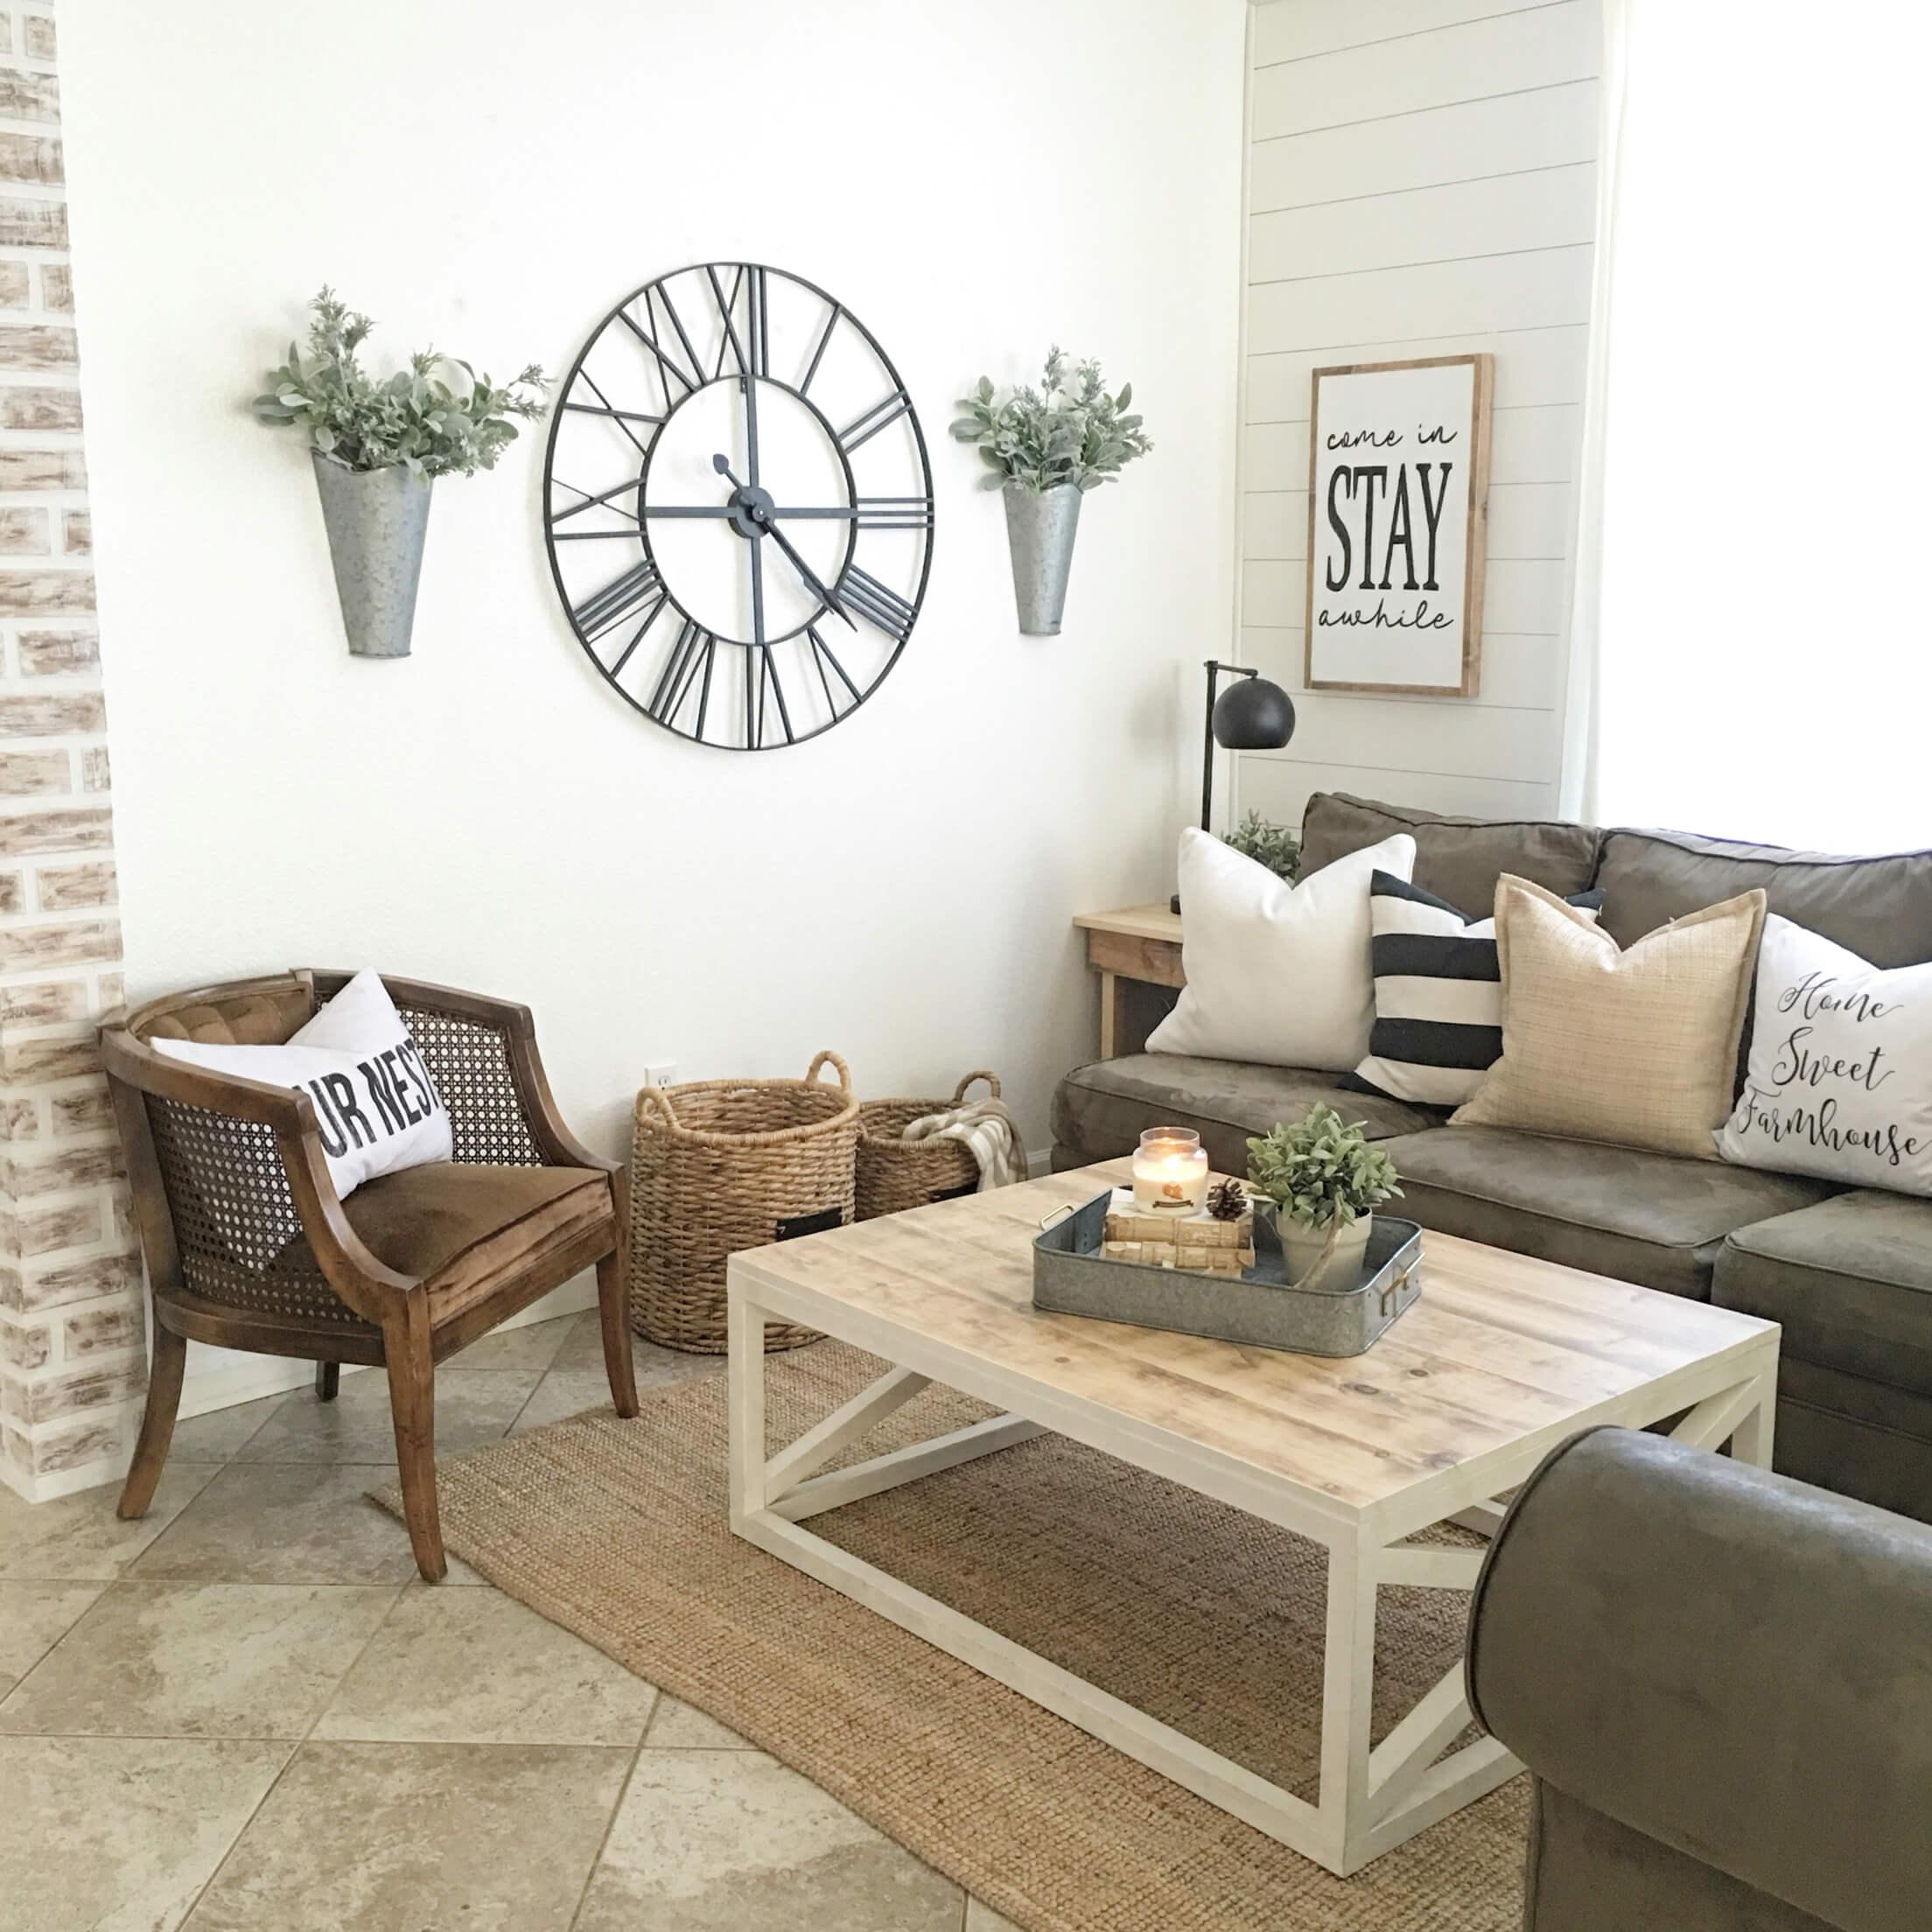 Farmhouse Style Small Living Room Decor Idea